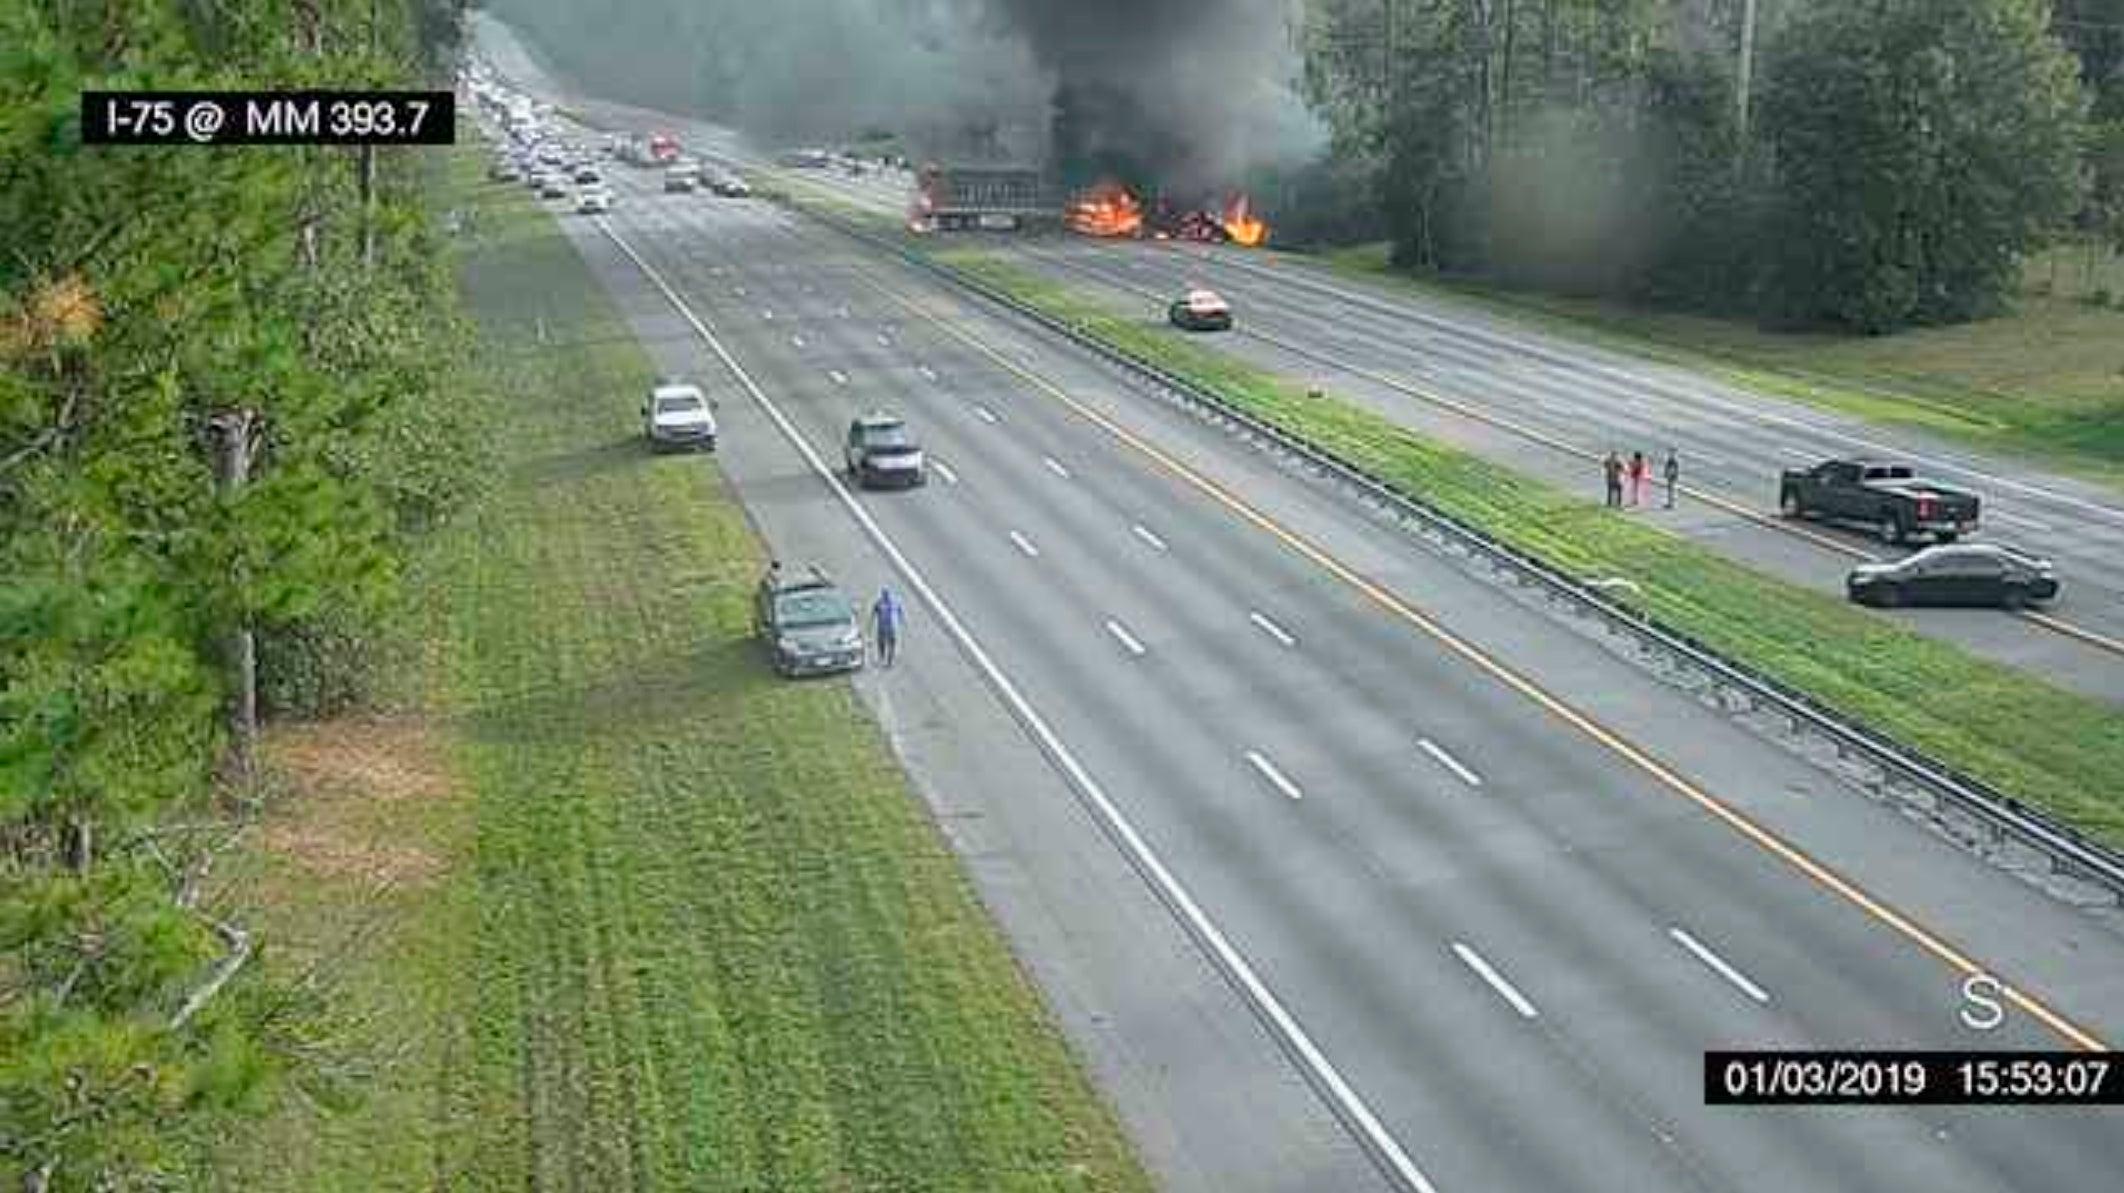 7 killed, 8 injured in crash, explosion on Florida highway | Boston com